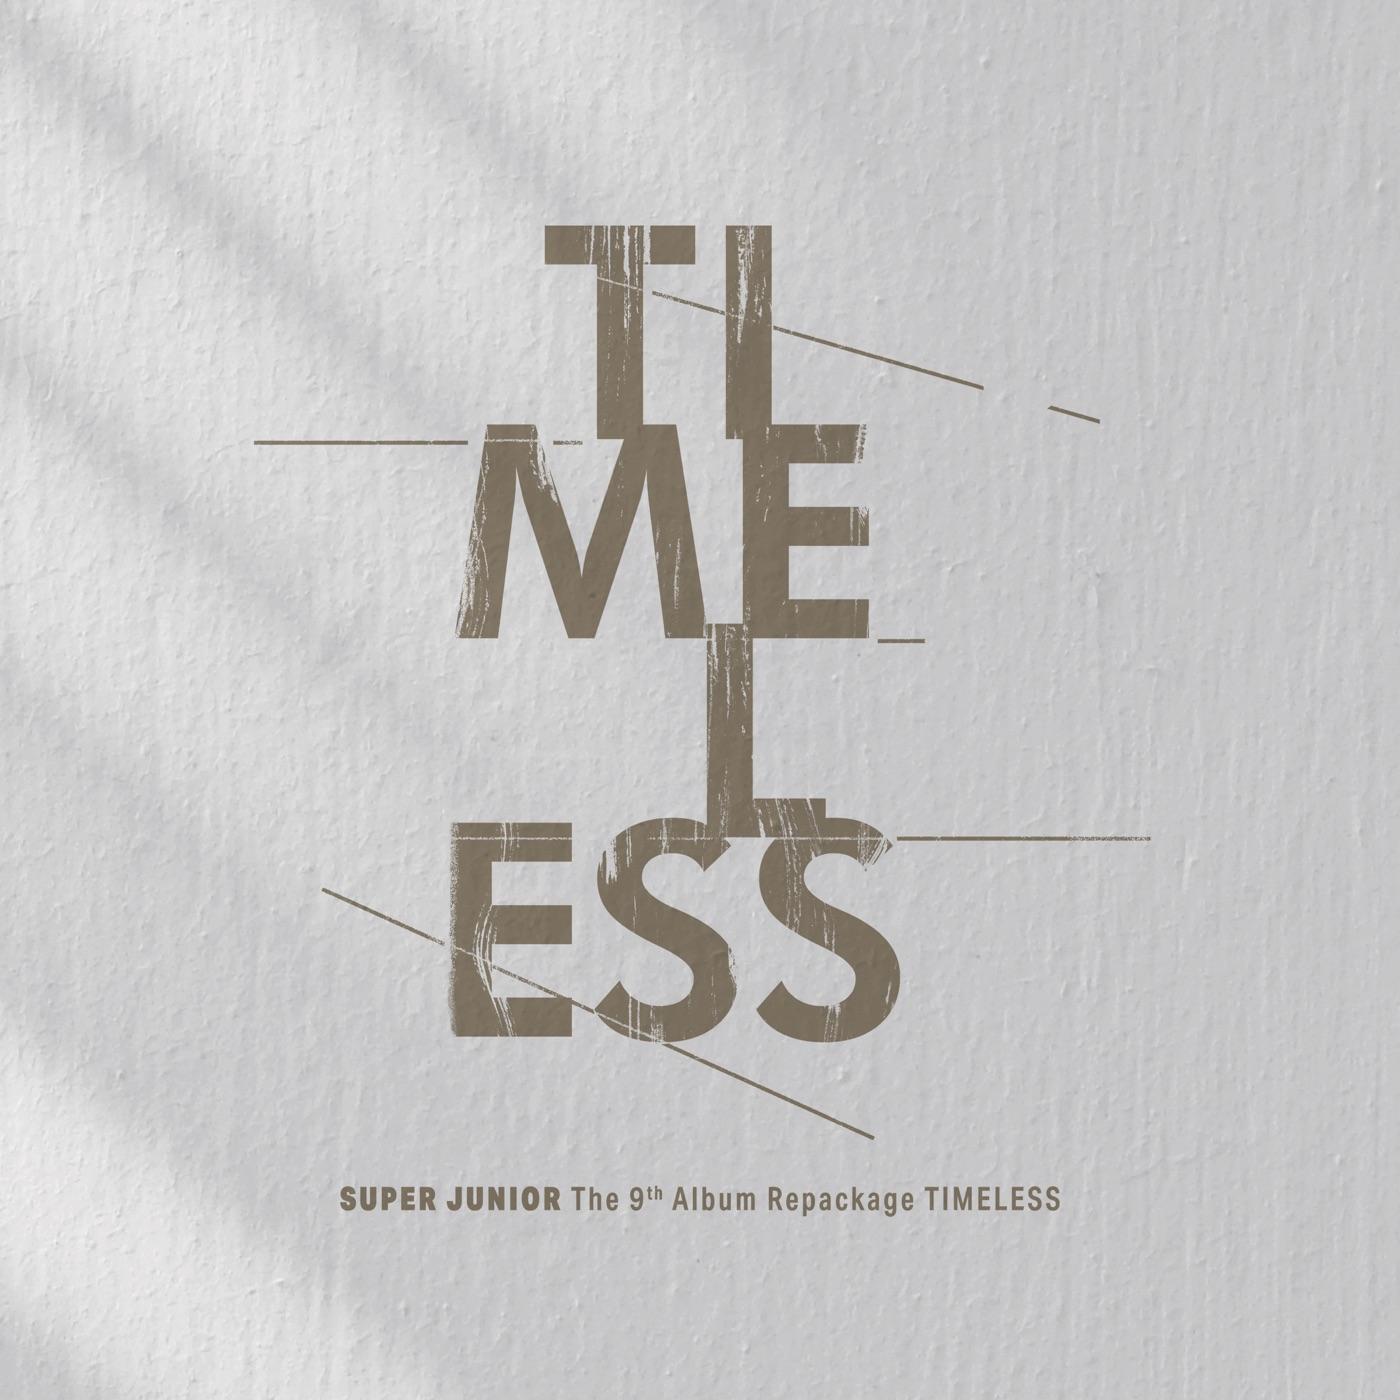 Timeless (SUPER JUNIOR)